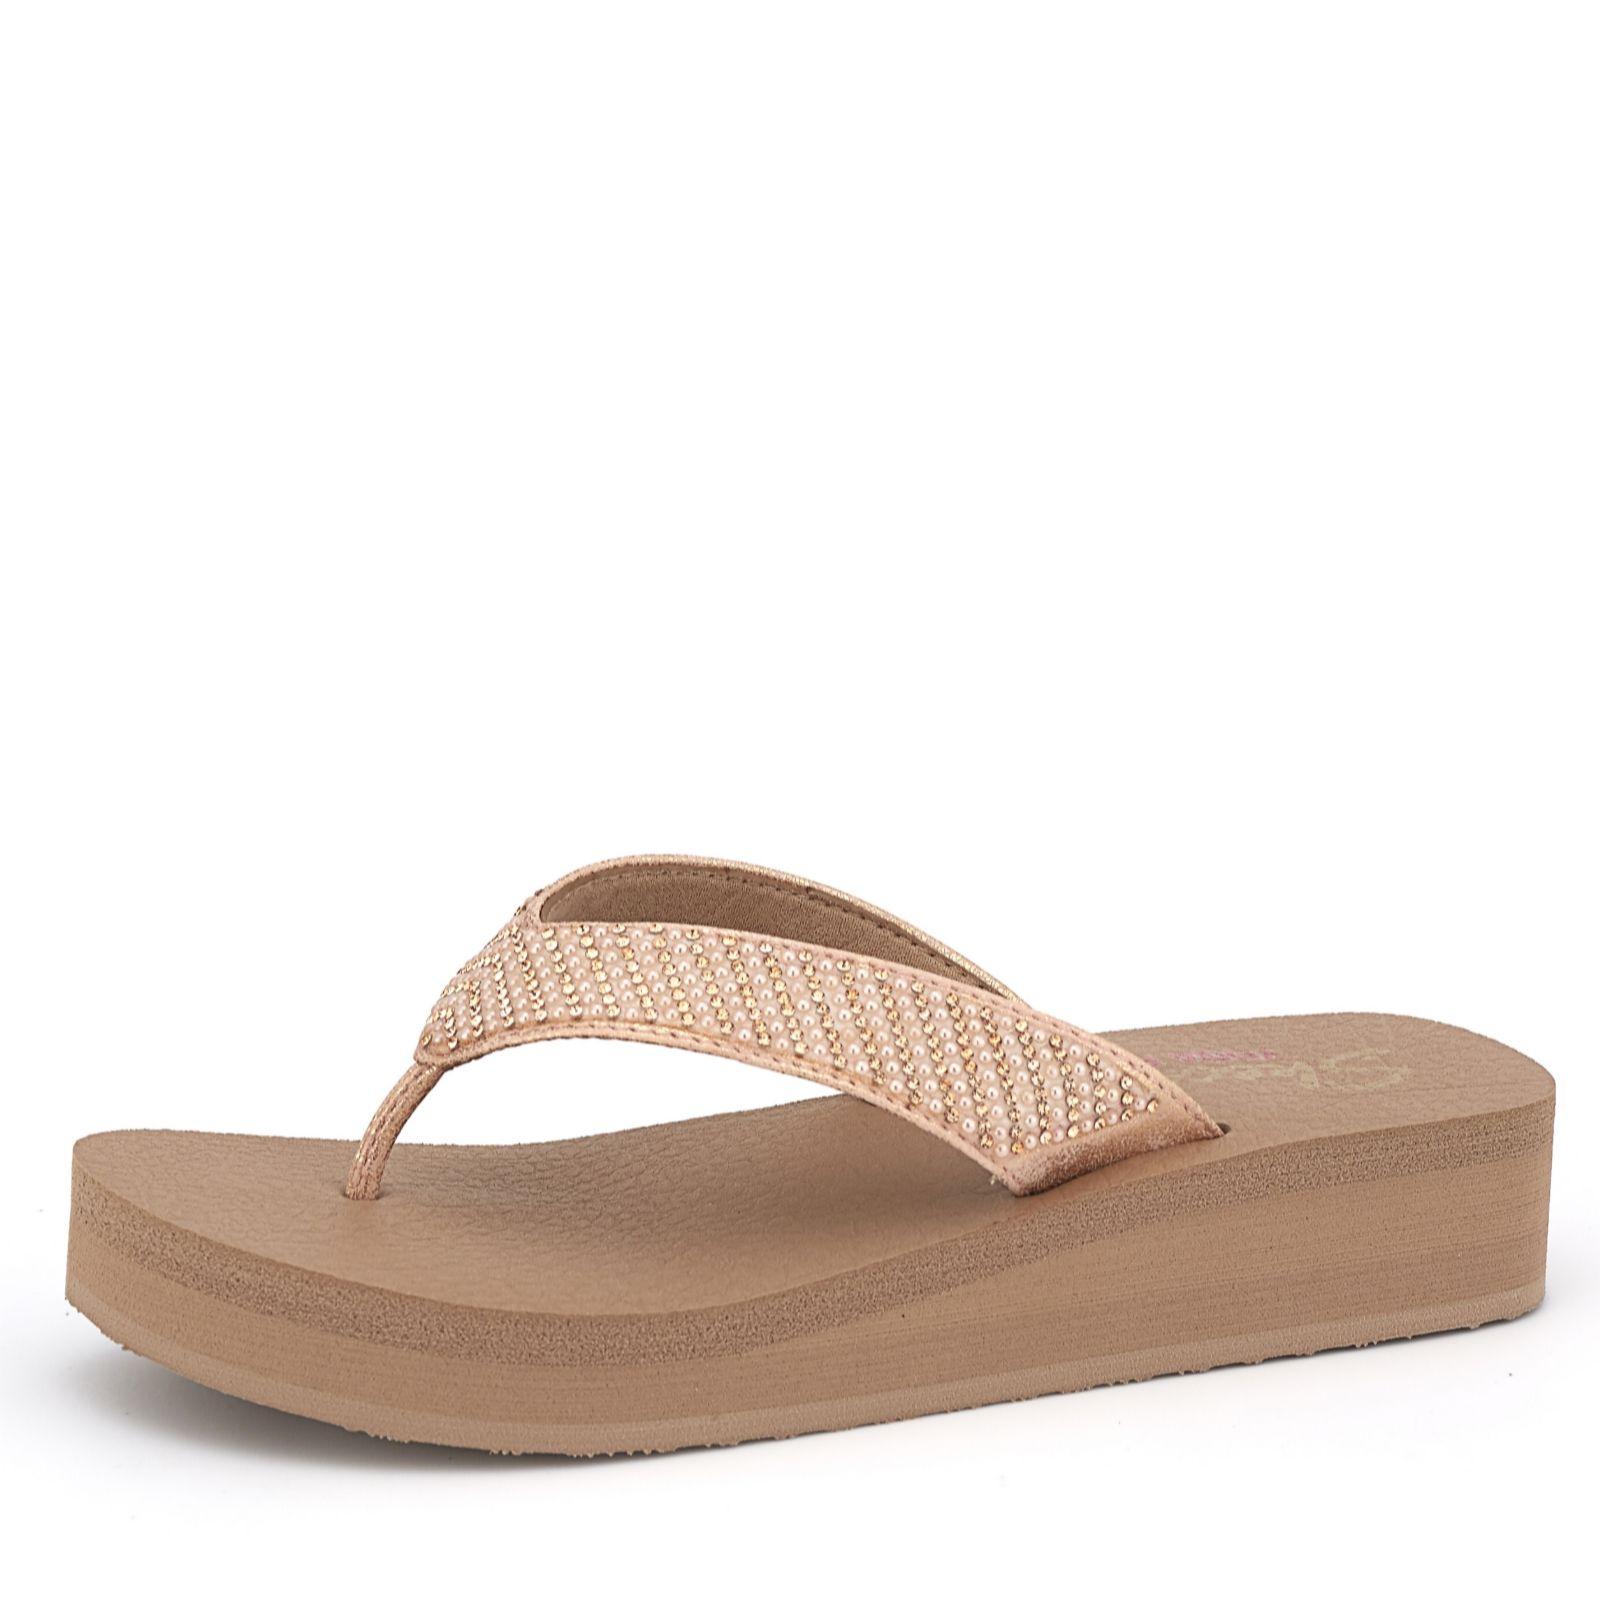 Skechers Vinyasa Pearl & Rhinestone Toe Post Sandal with Yoga Foam - QVC UK